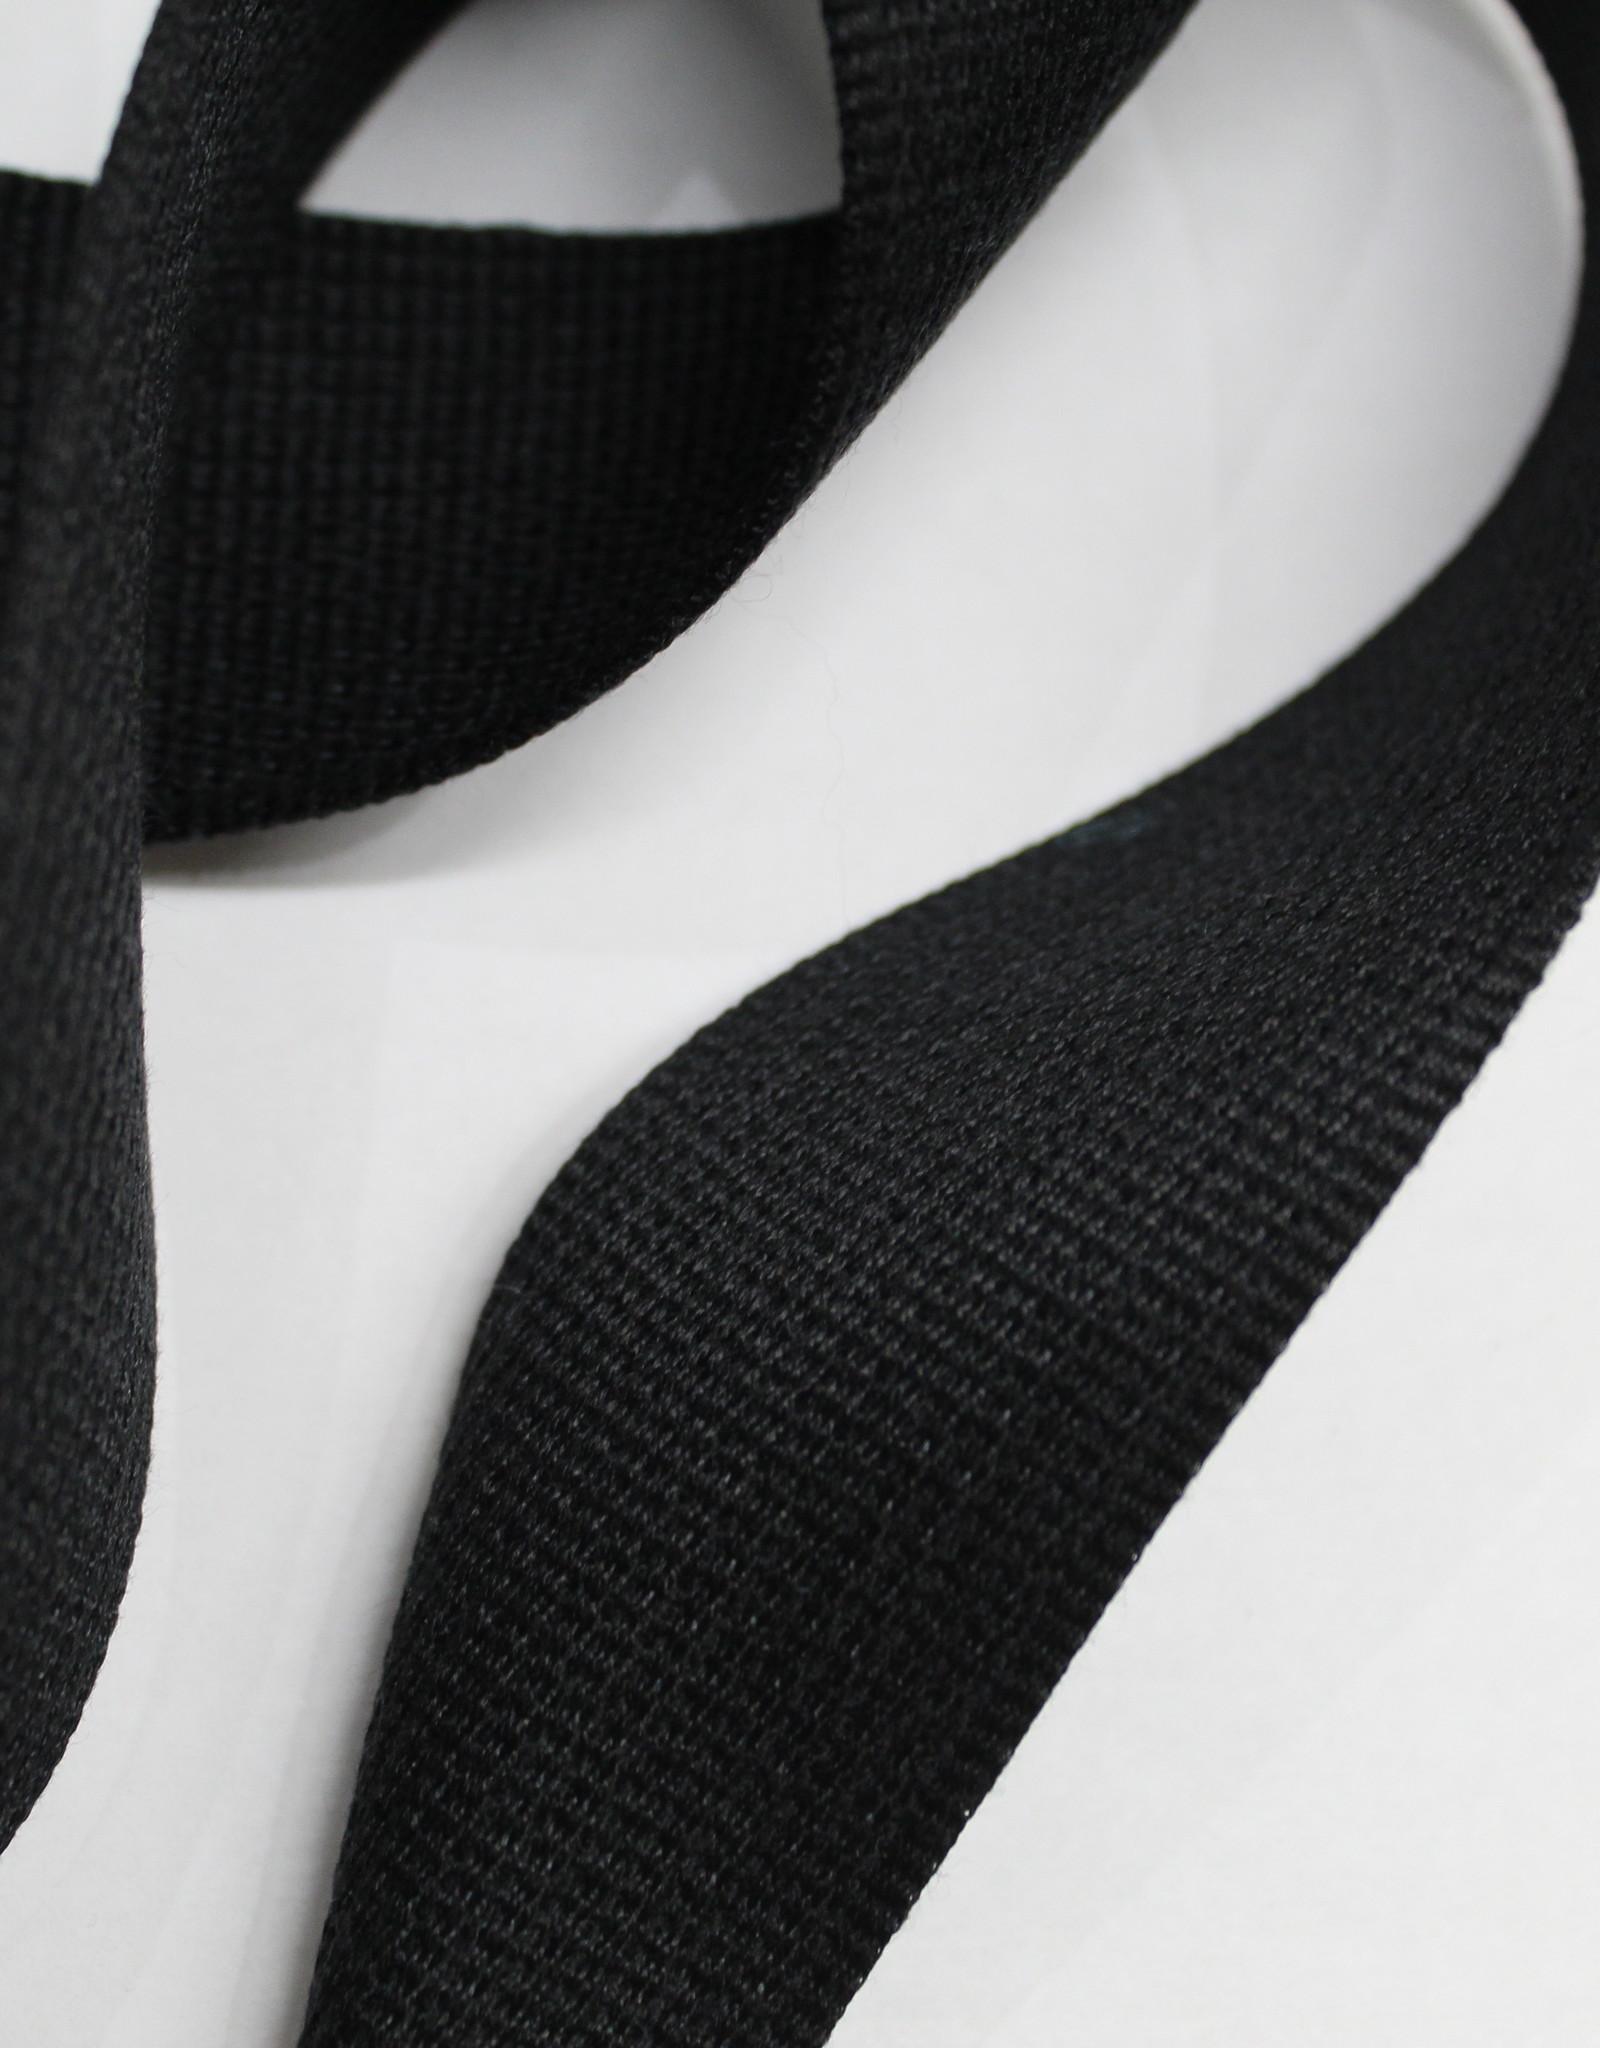 Soepele tassenband 40mm zwart